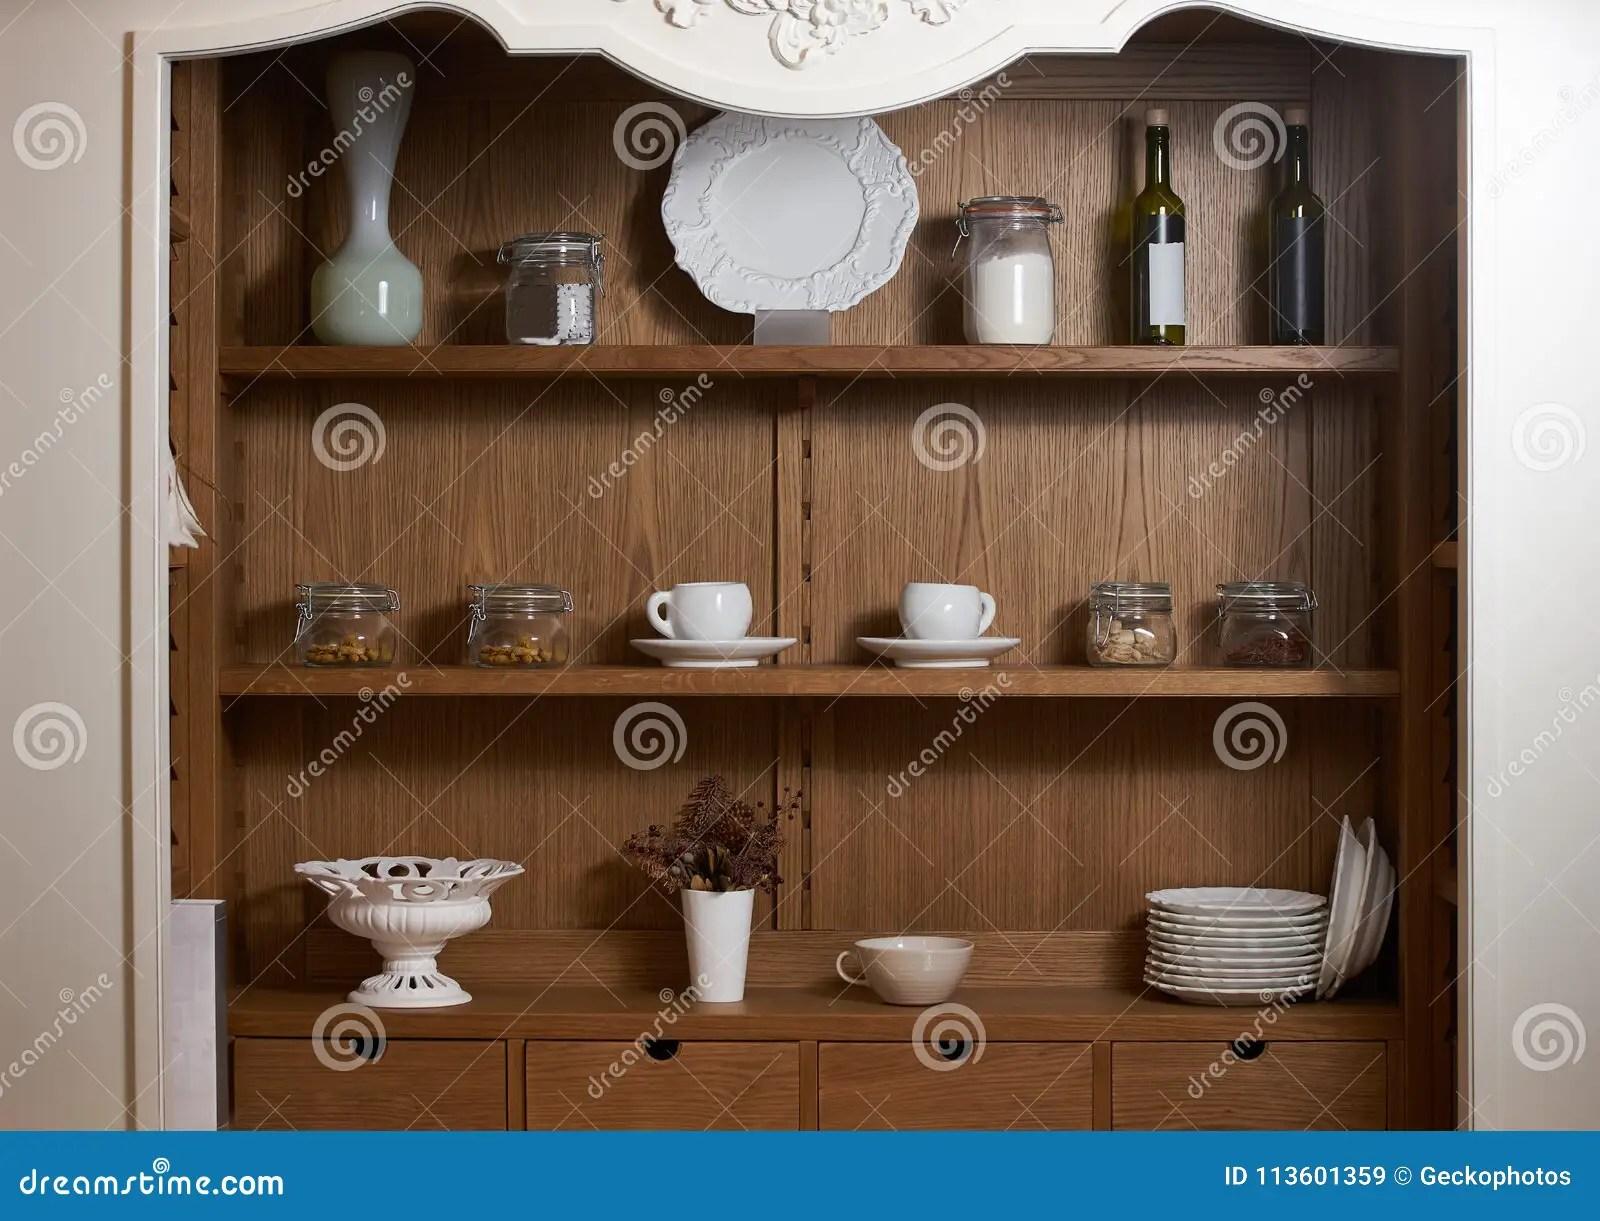 kitchen sideboards toy hauler with outdoor 有精密土气餐具的厨房碗柜库存图片 图片包括有茶碟 户内 空白 弯脚的 有精密土气餐具的厨房碗柜